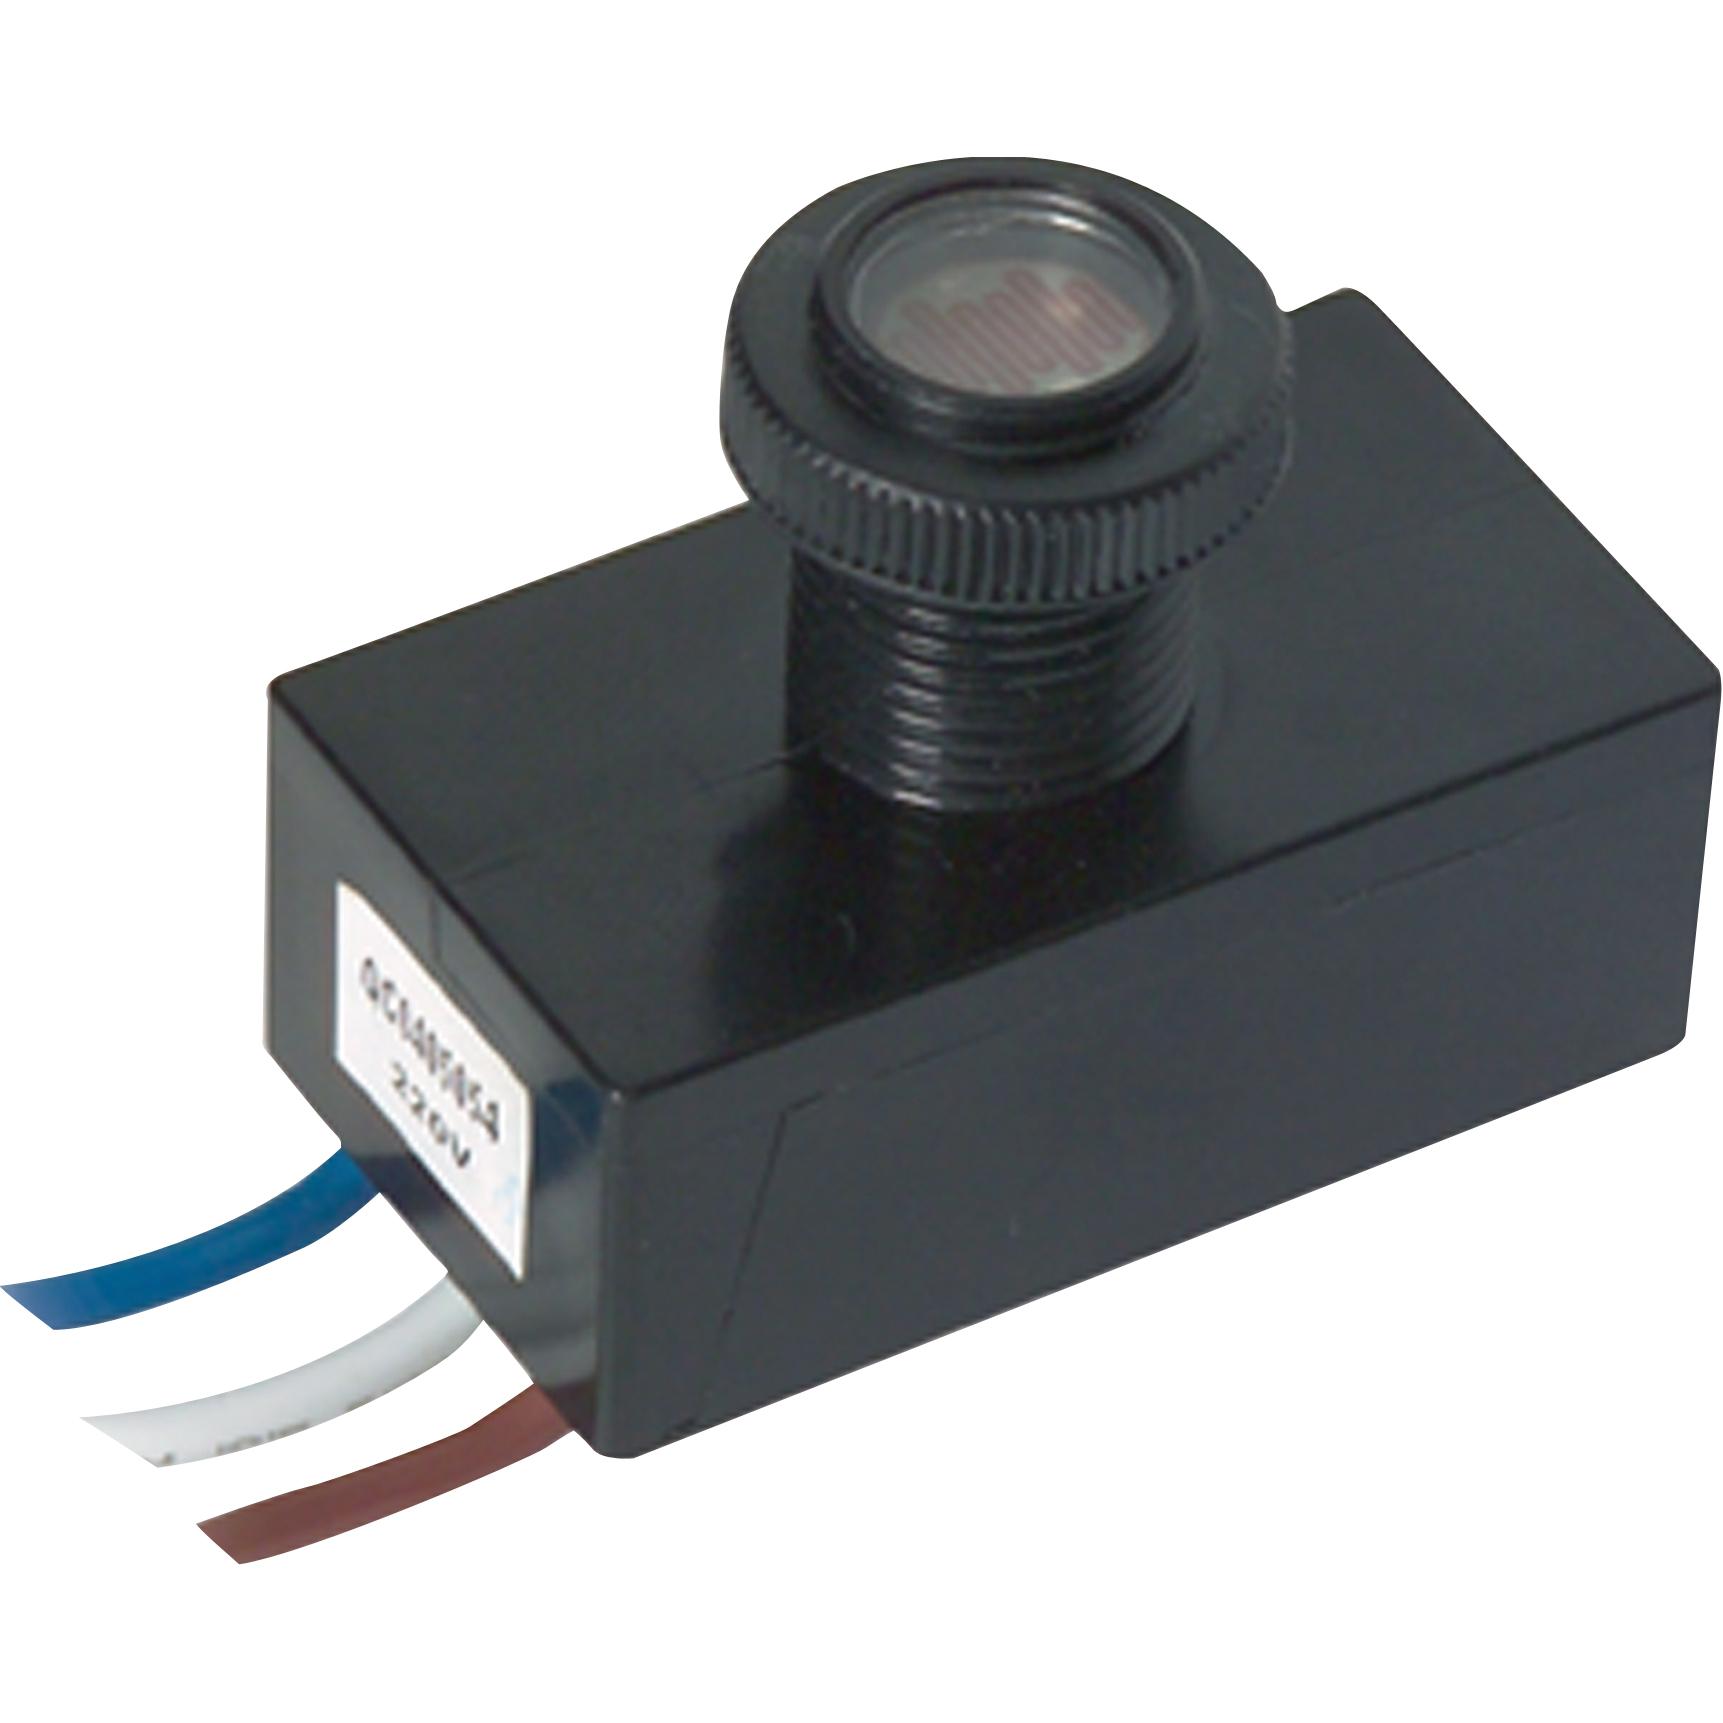 Diagram Knightsbridge Trrpc Remote Photocell Dusk To Dawn Sensor